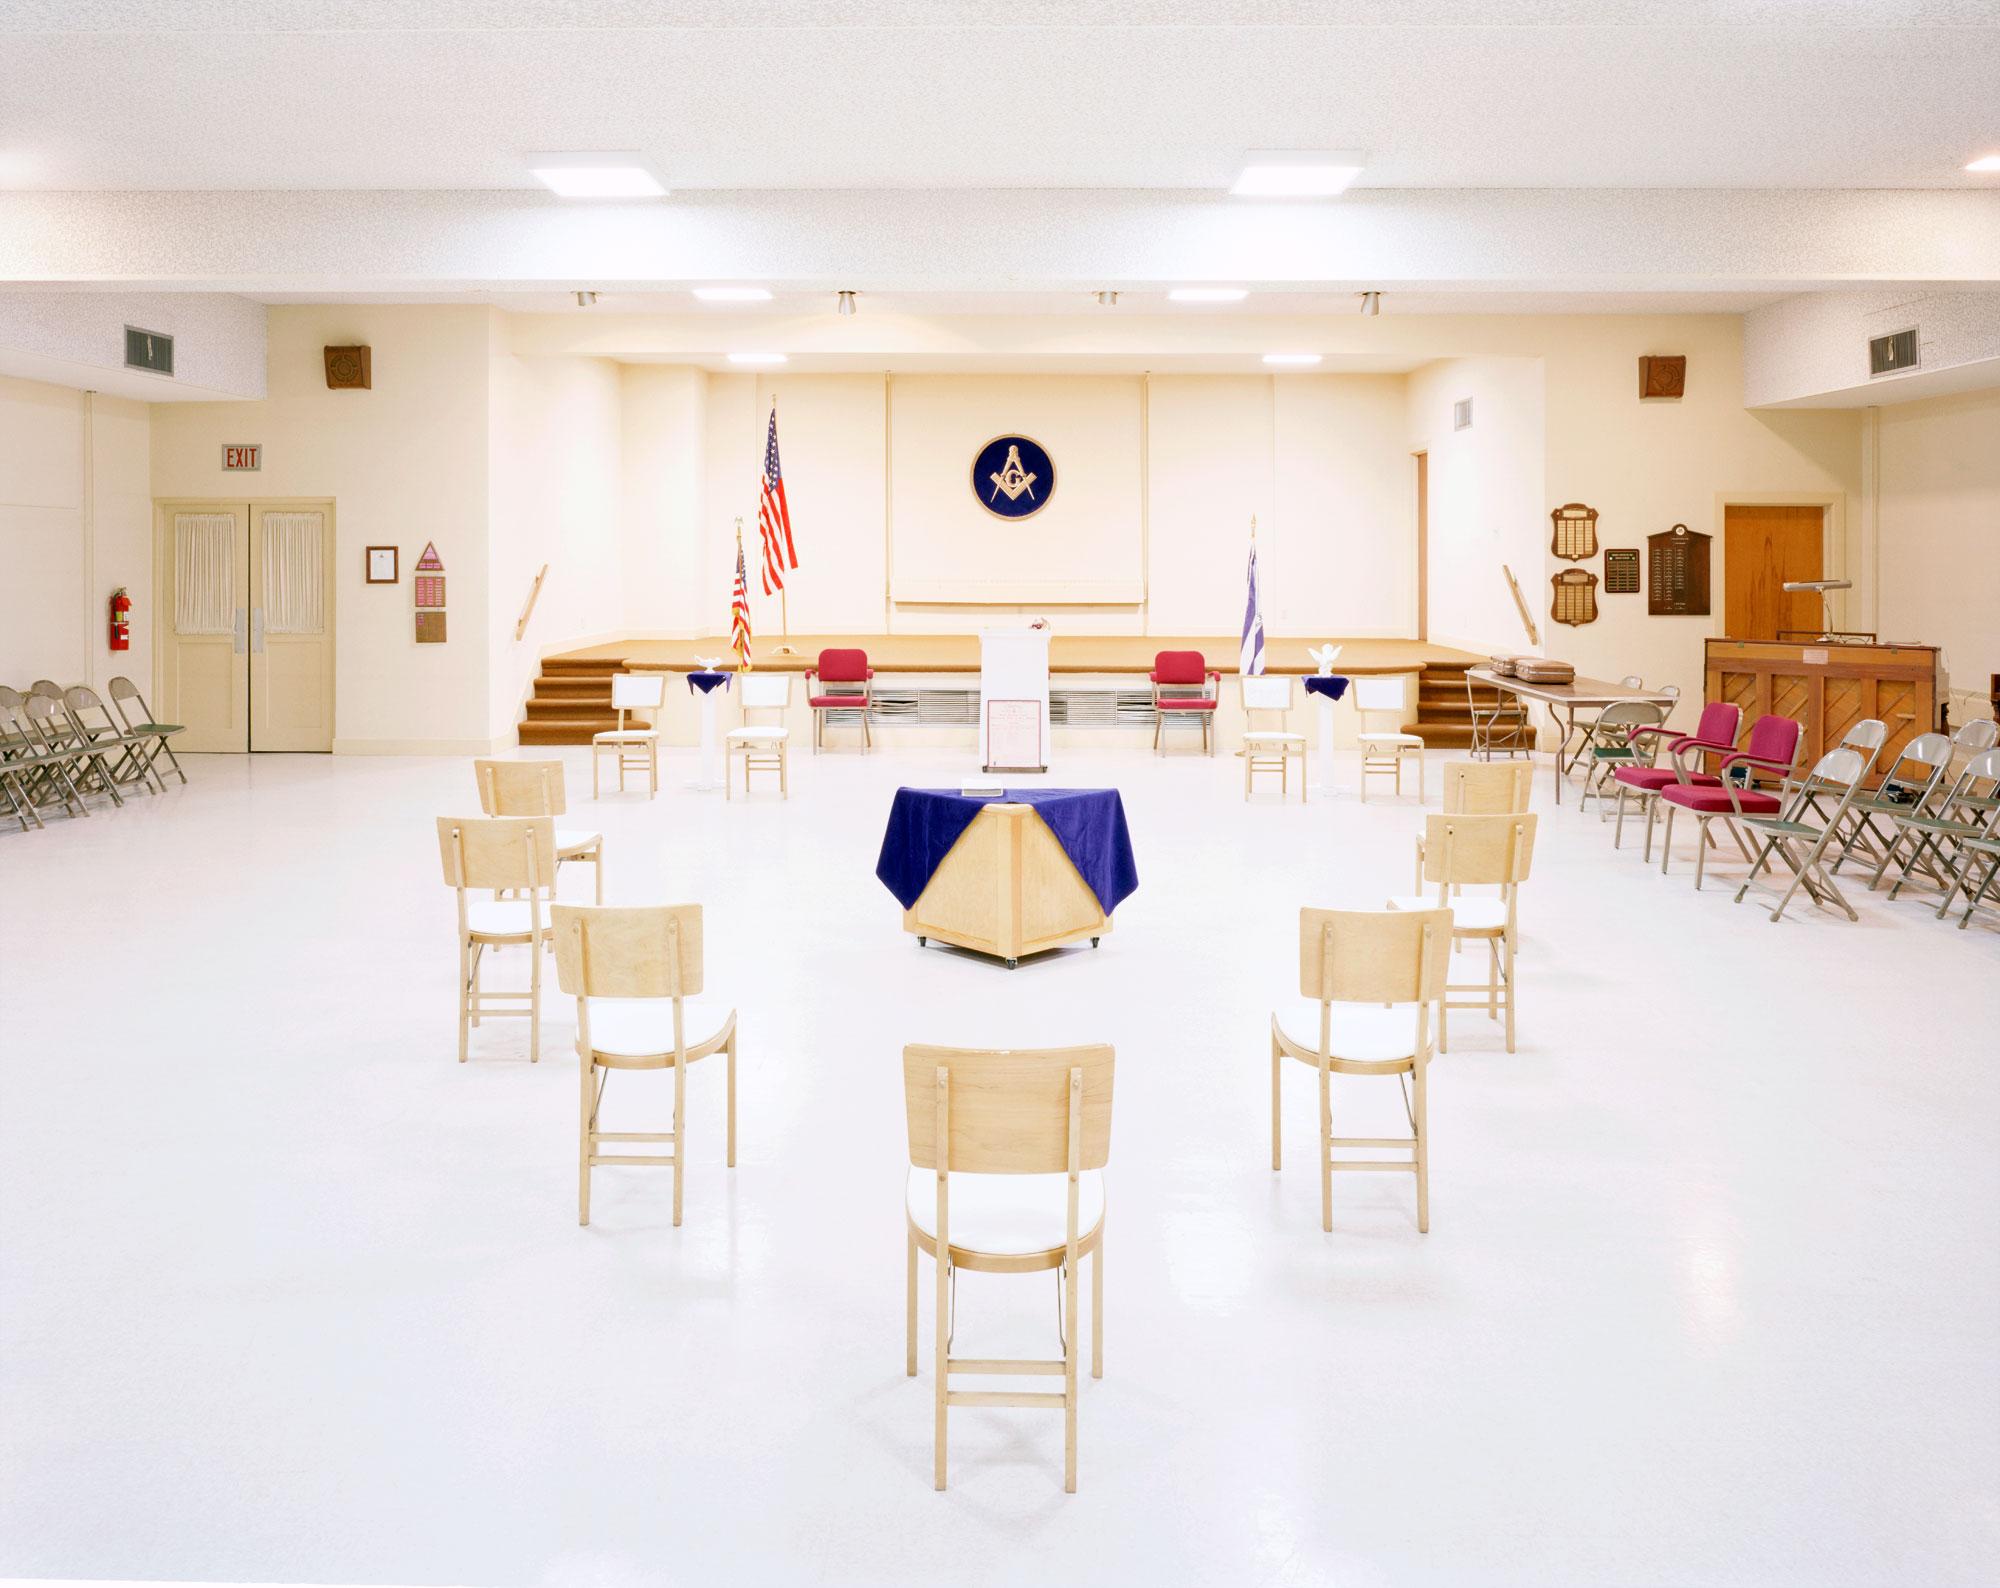 Bethel 17, Hershey, PA